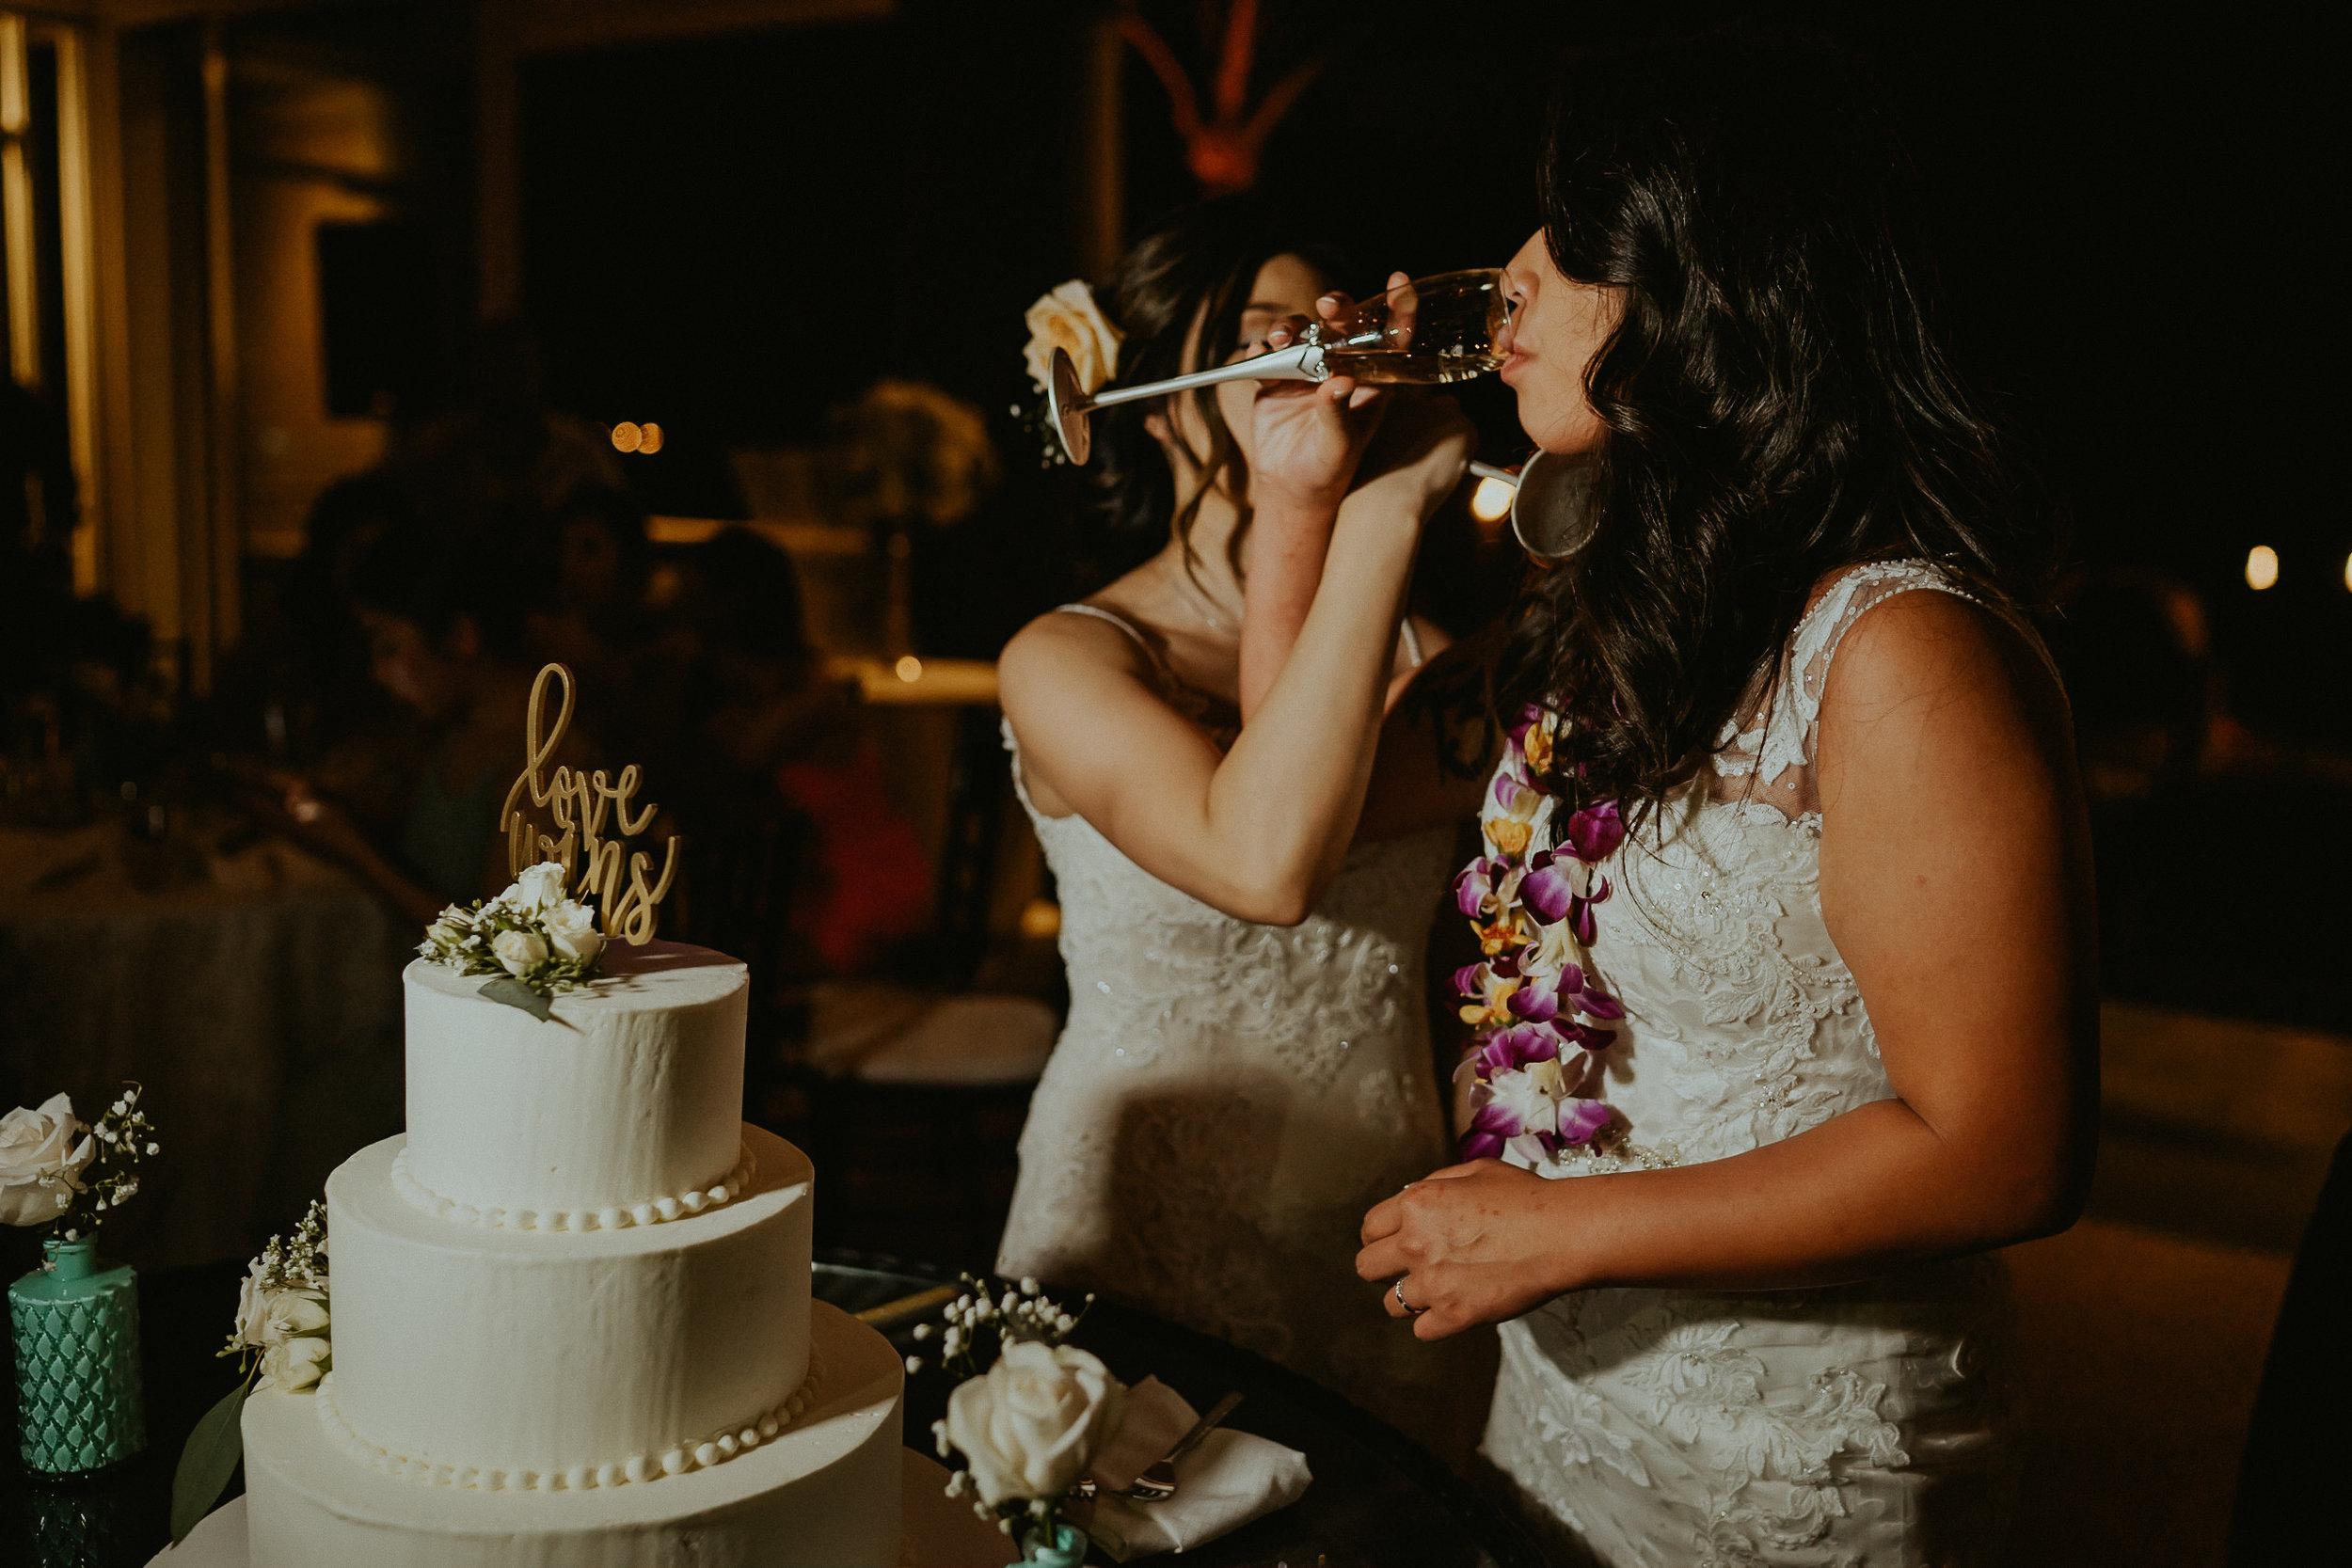 Maui_Destination_wedding_Alfred_Tang-94.jpg